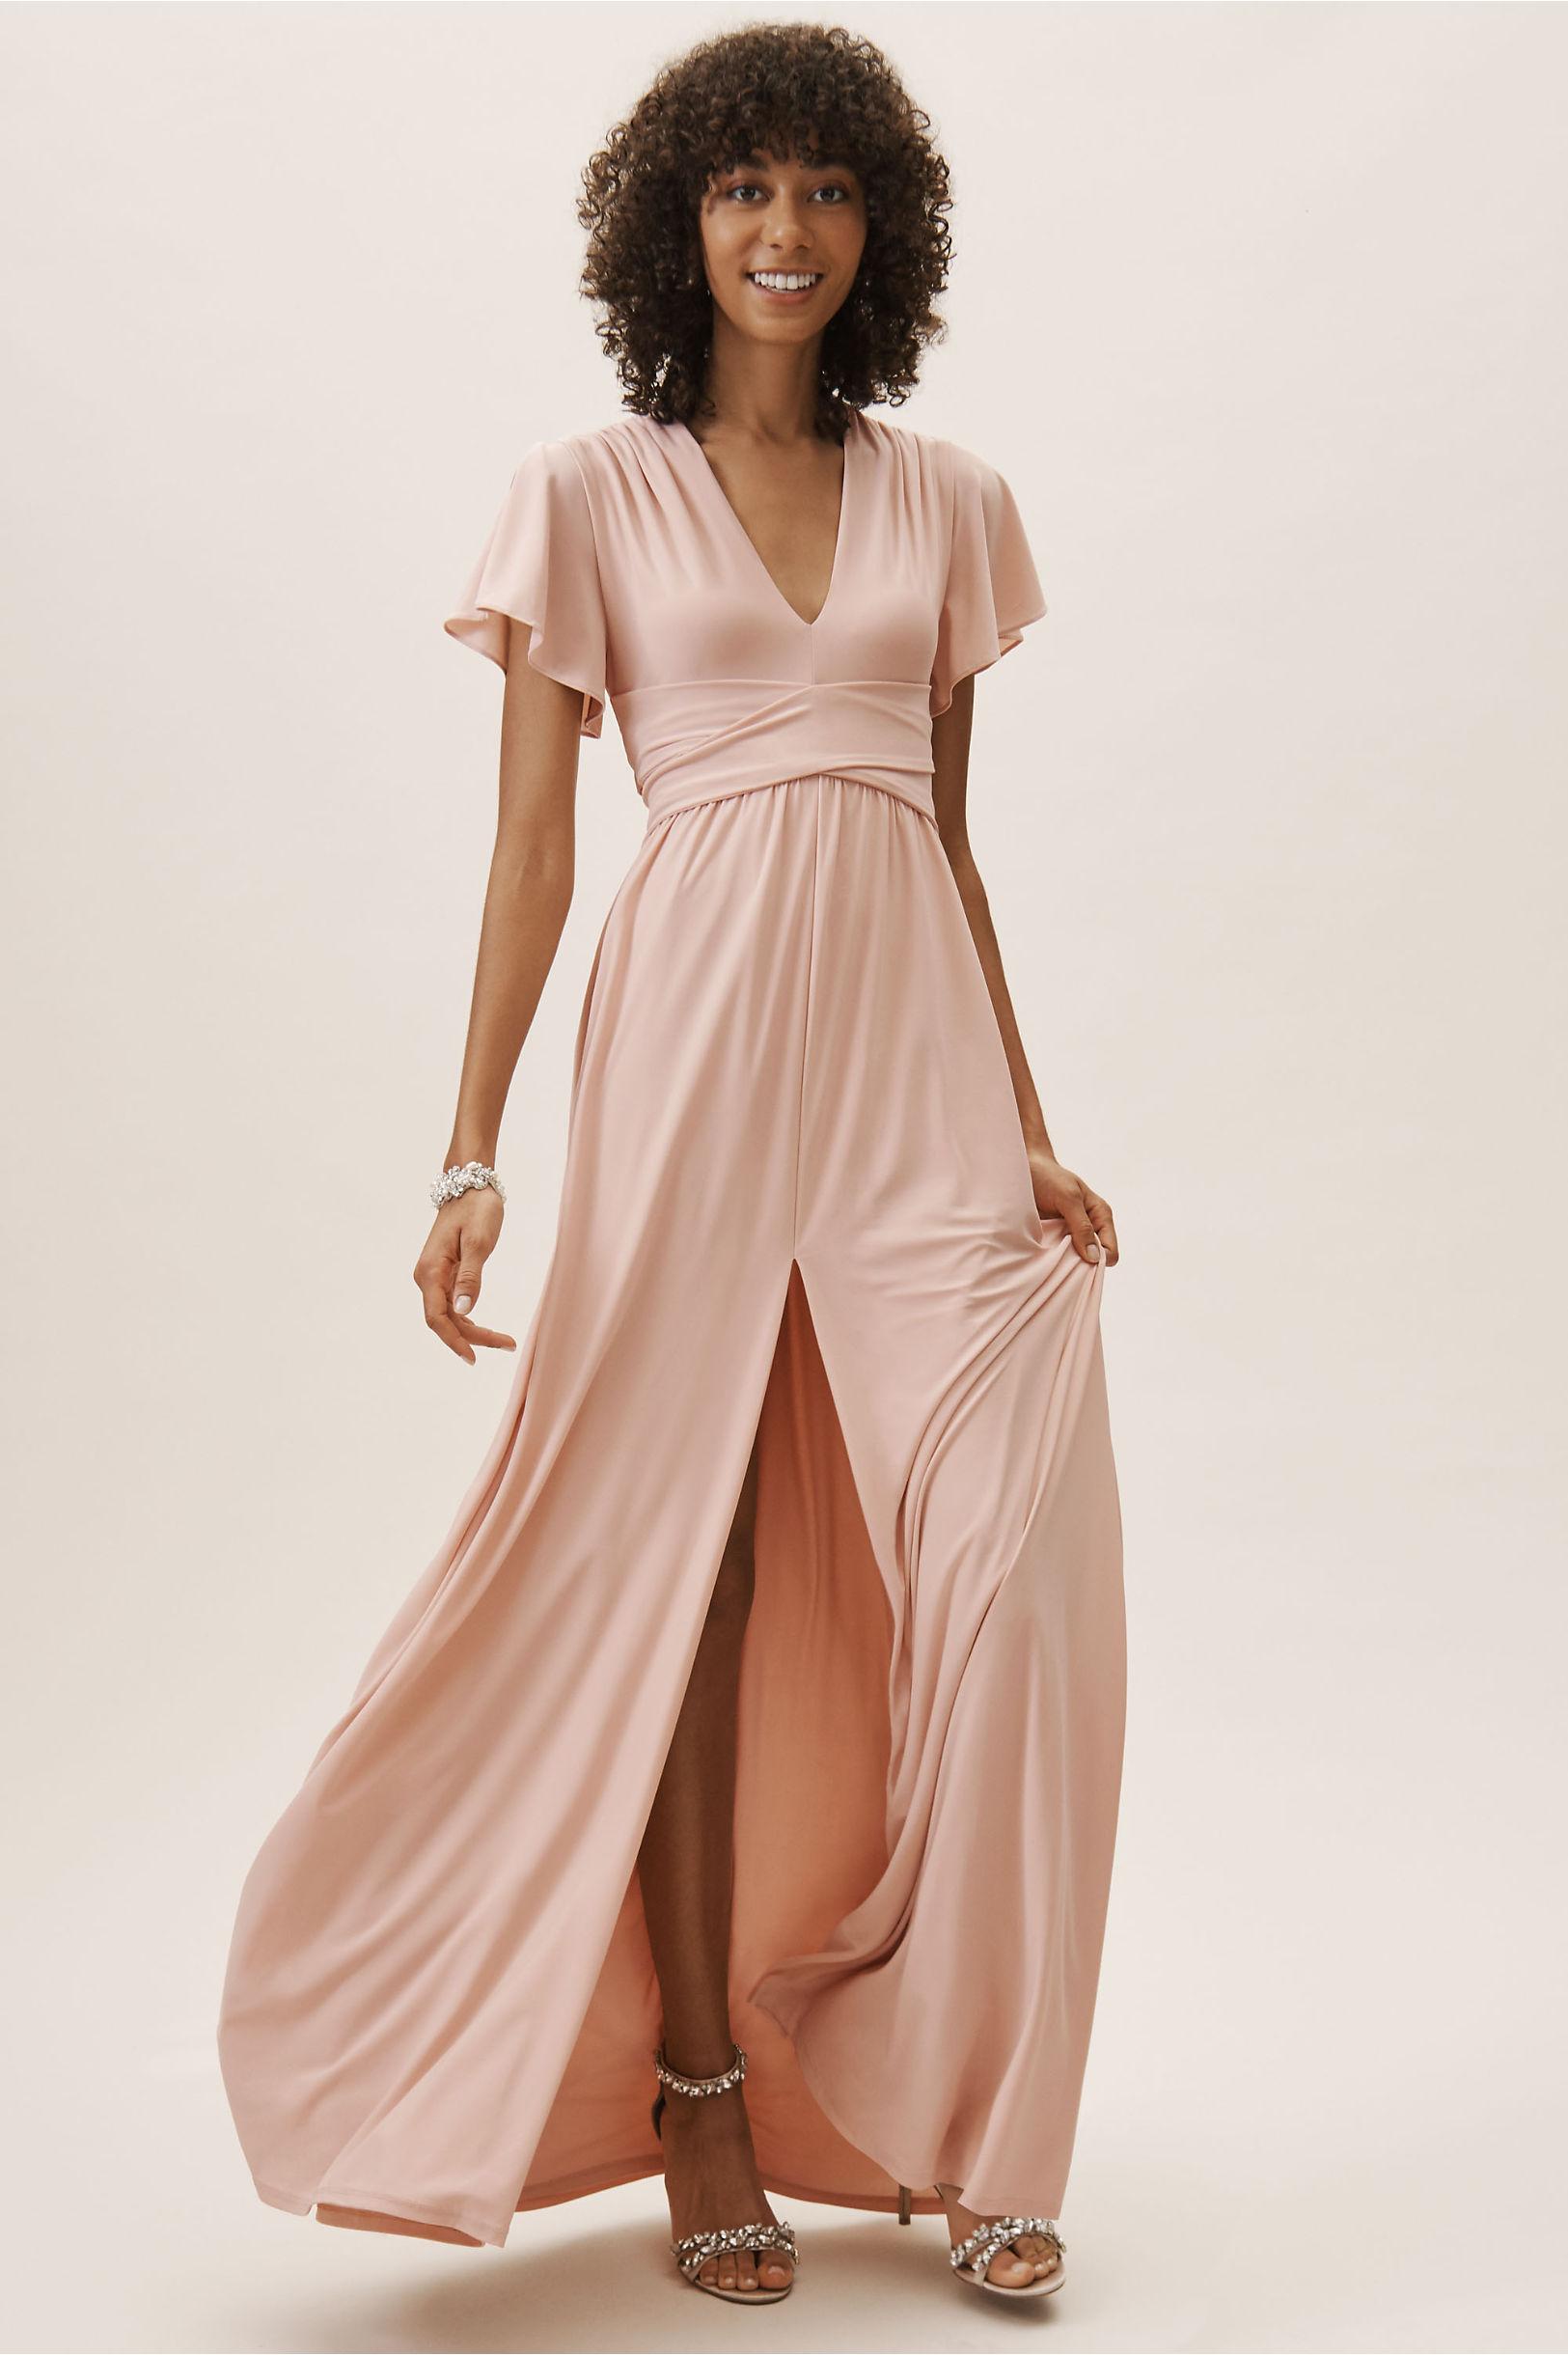 708104d9a08 Mendoza Dress Blush in Bridesmaids   Bridal Party